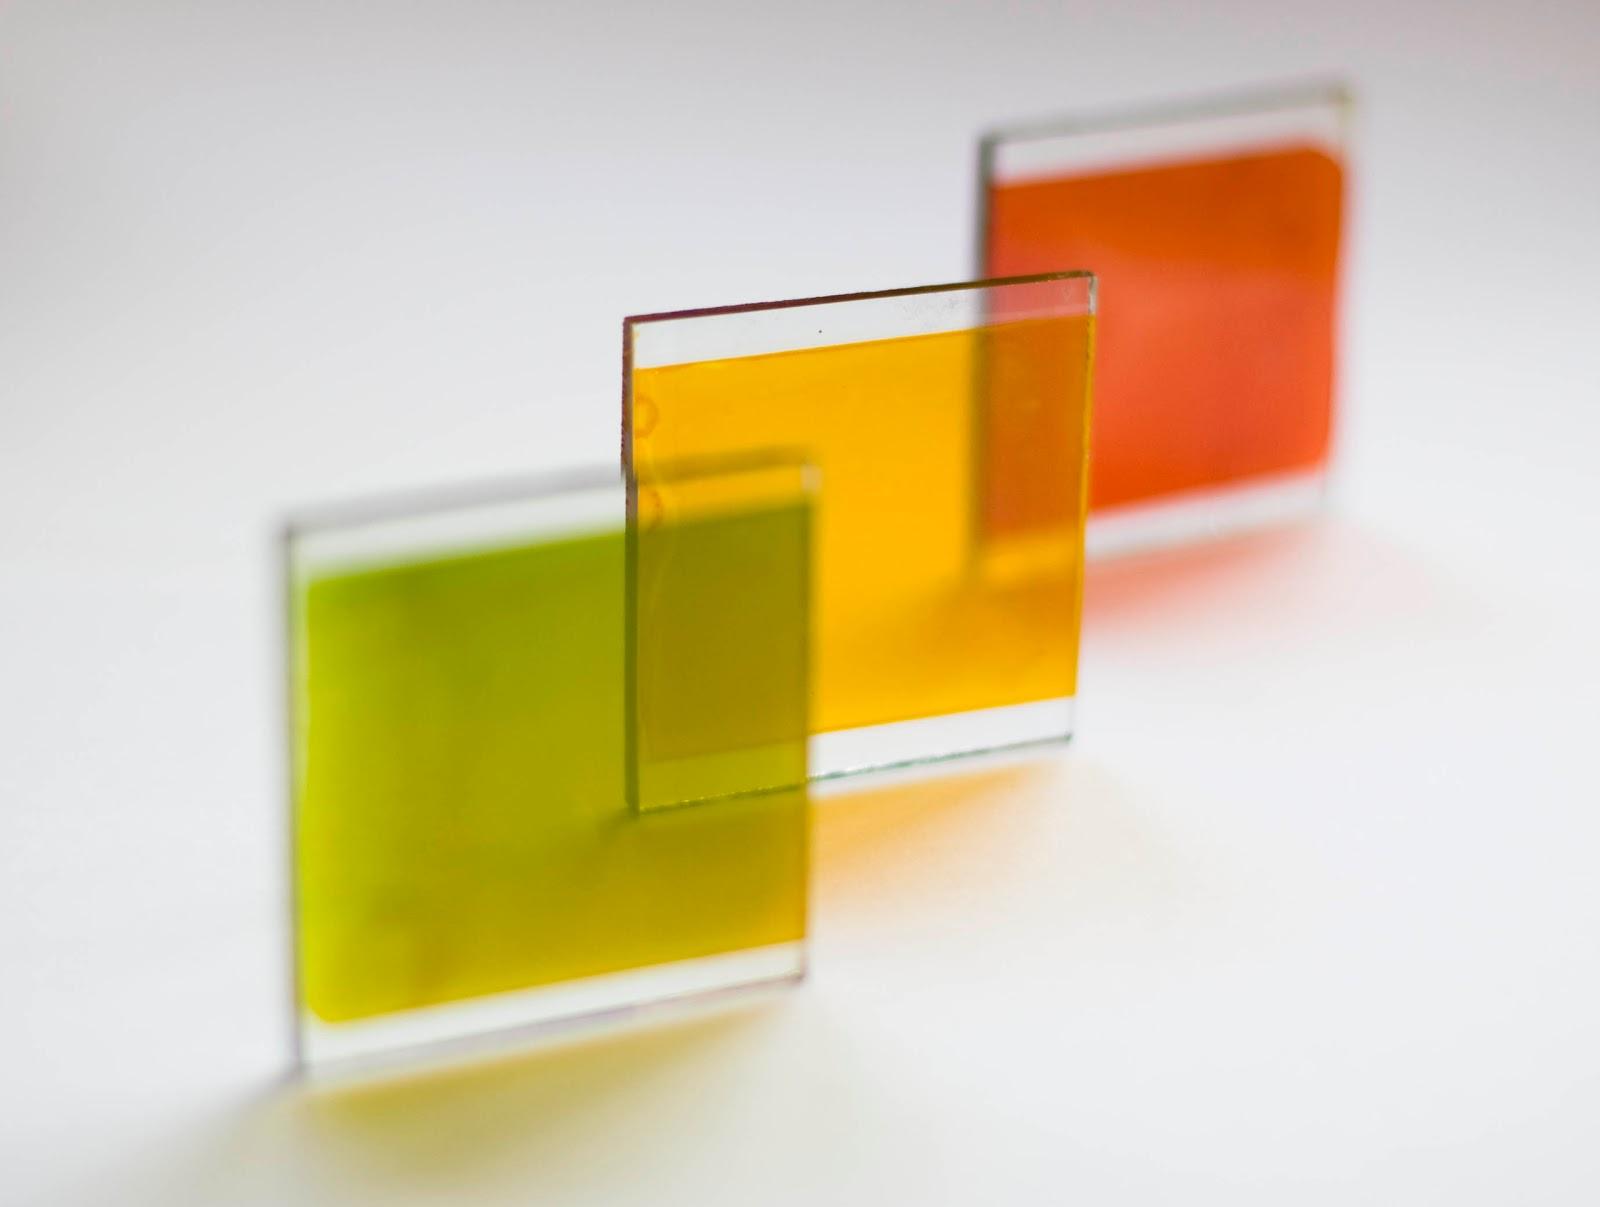 Near Term Transparent Solar Power Windows Could Provide 60